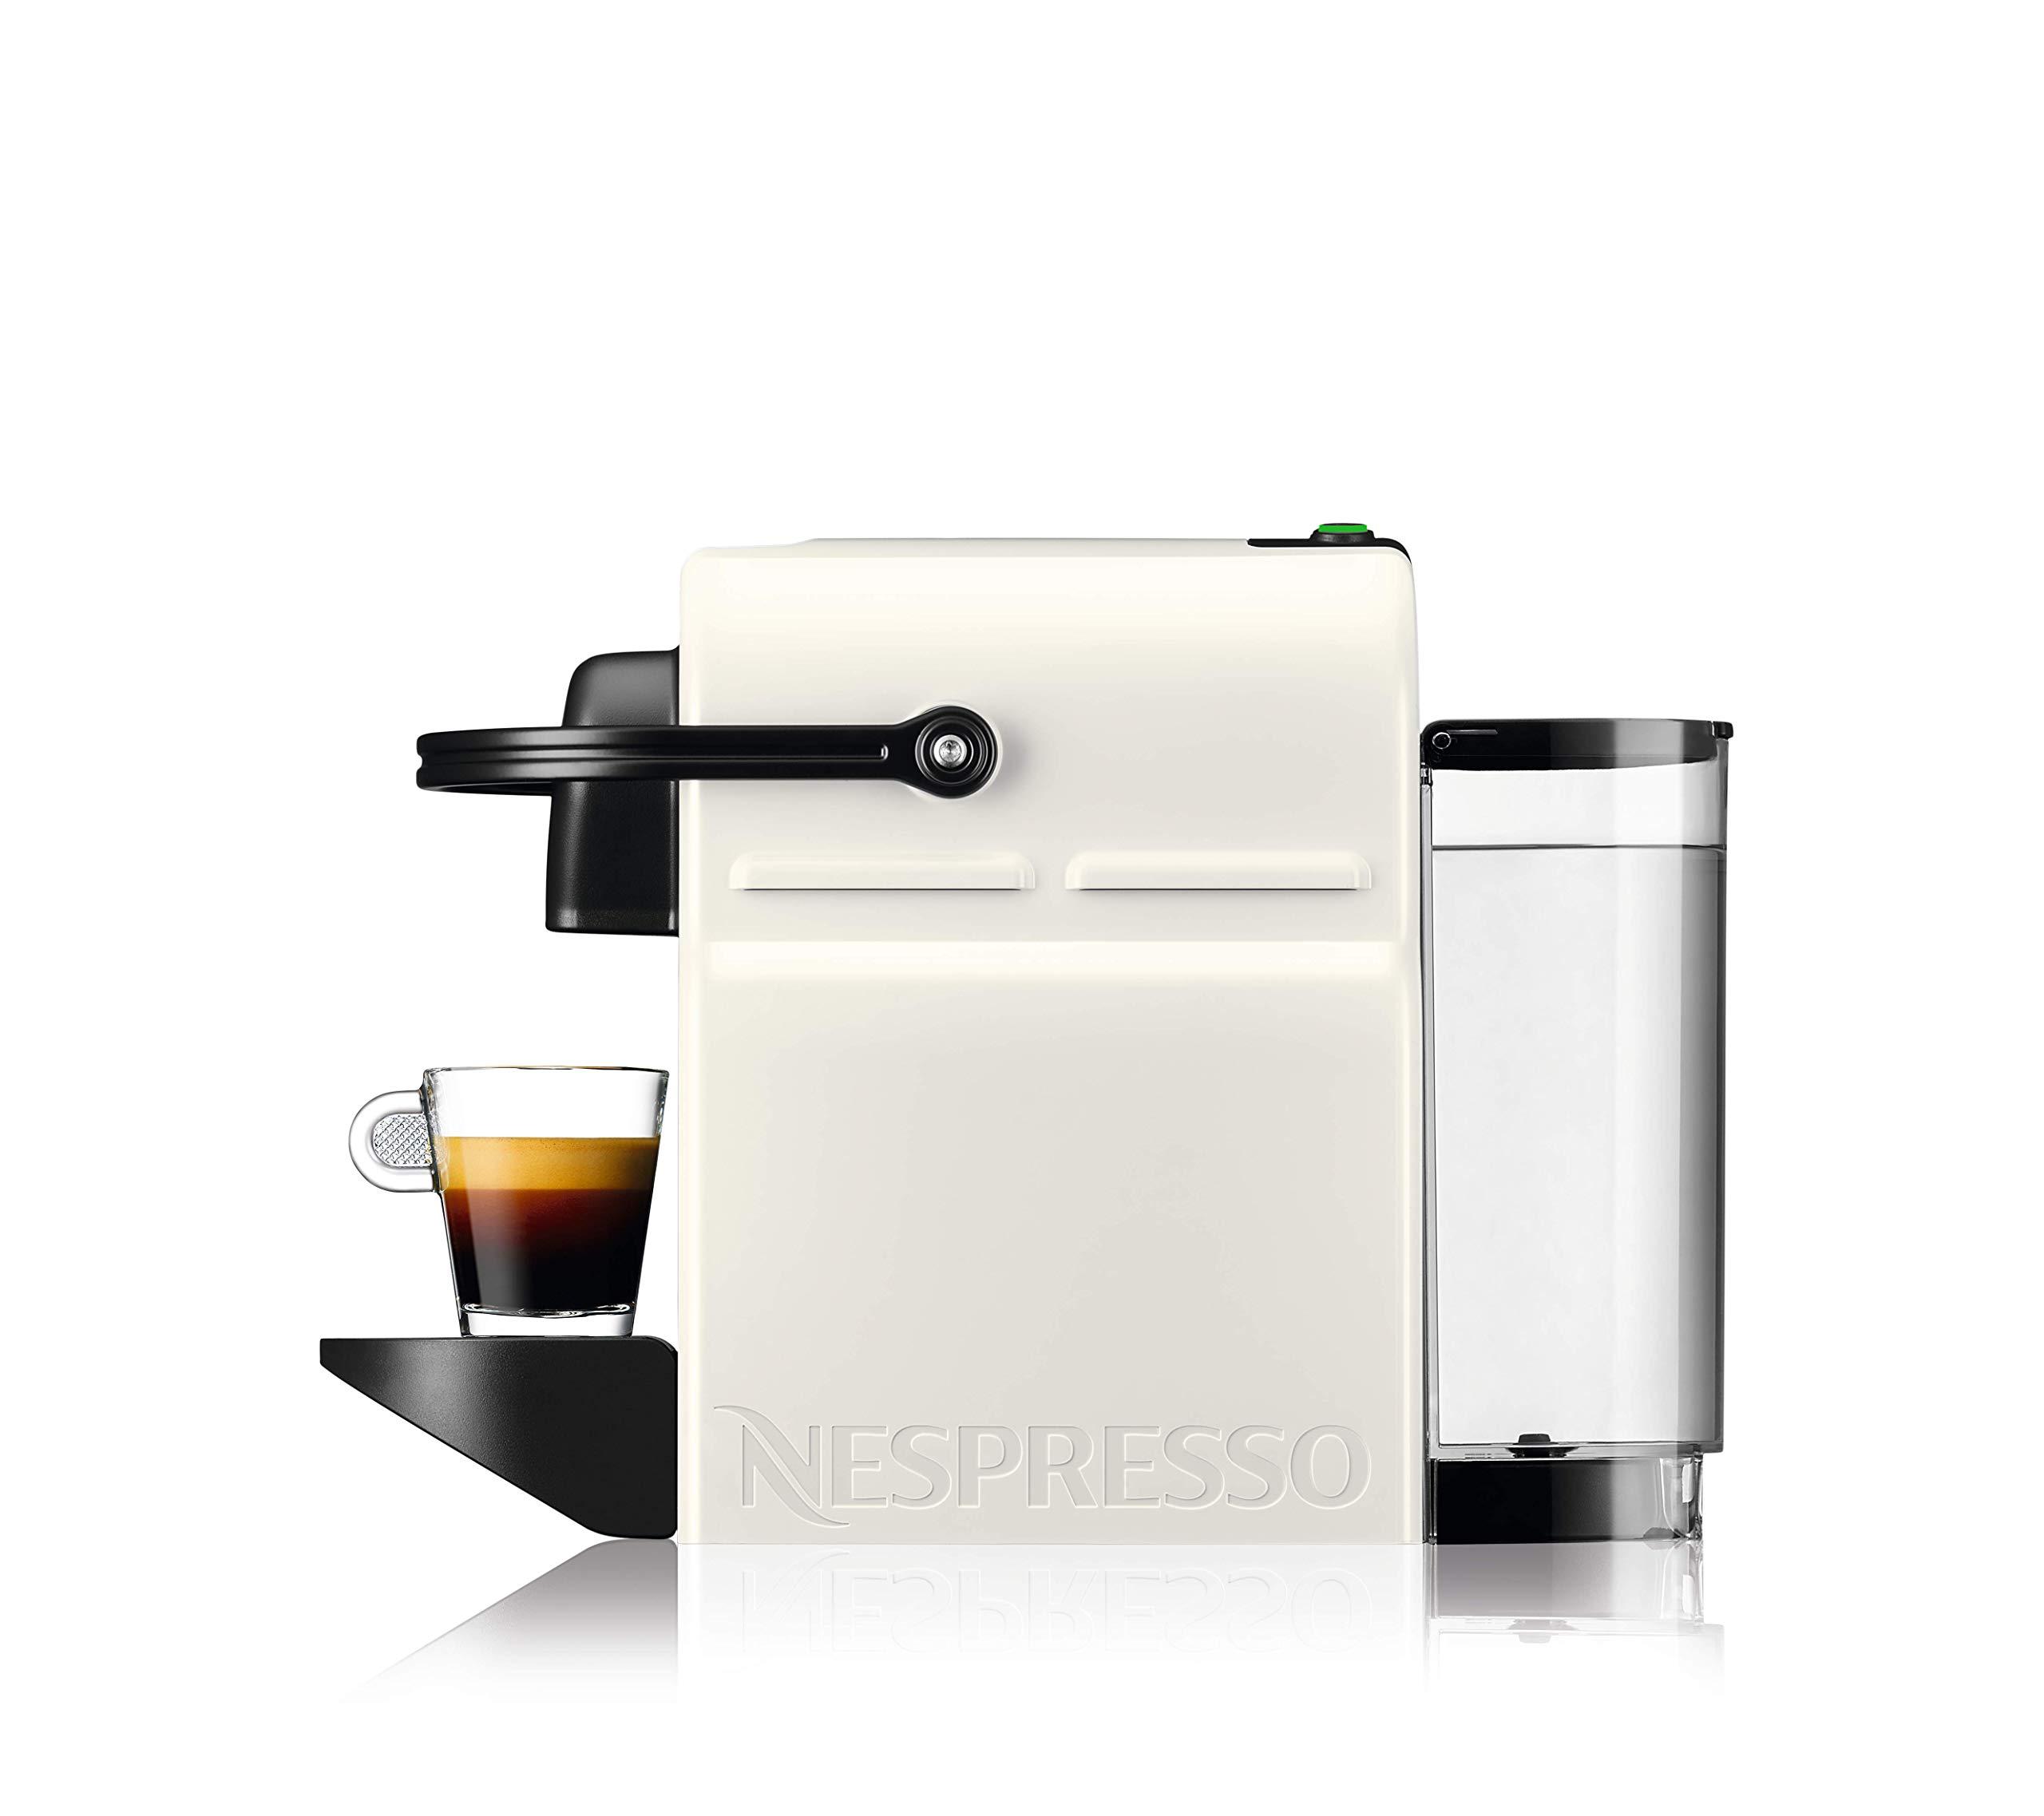 Krups-Nespresso-Inissia-Coffee-Capsule-Machine